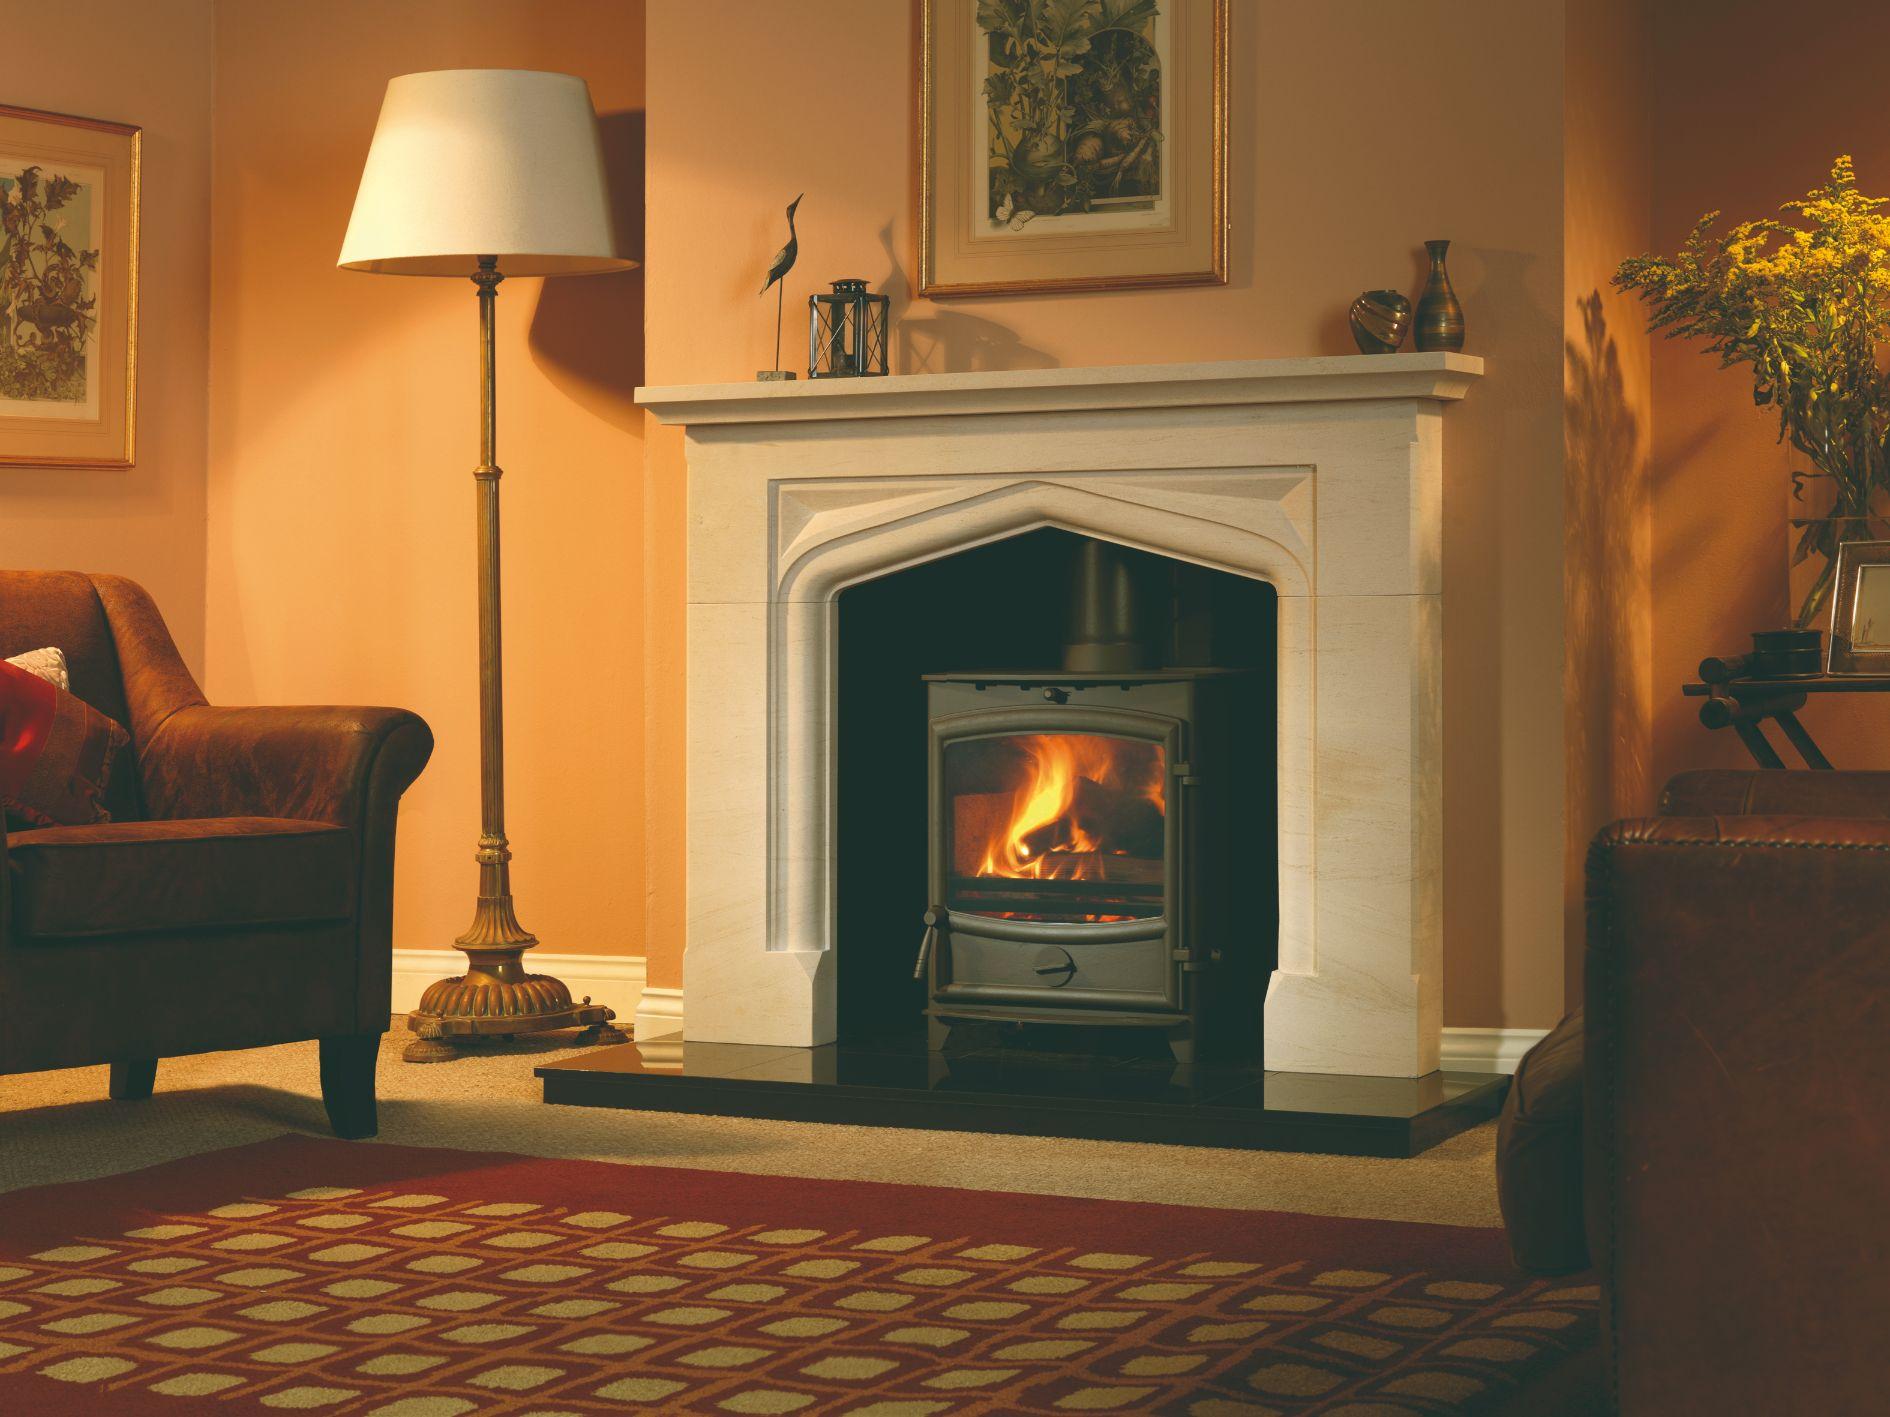 FX8 Boscombe Fireplace Surround and Granite Chamber